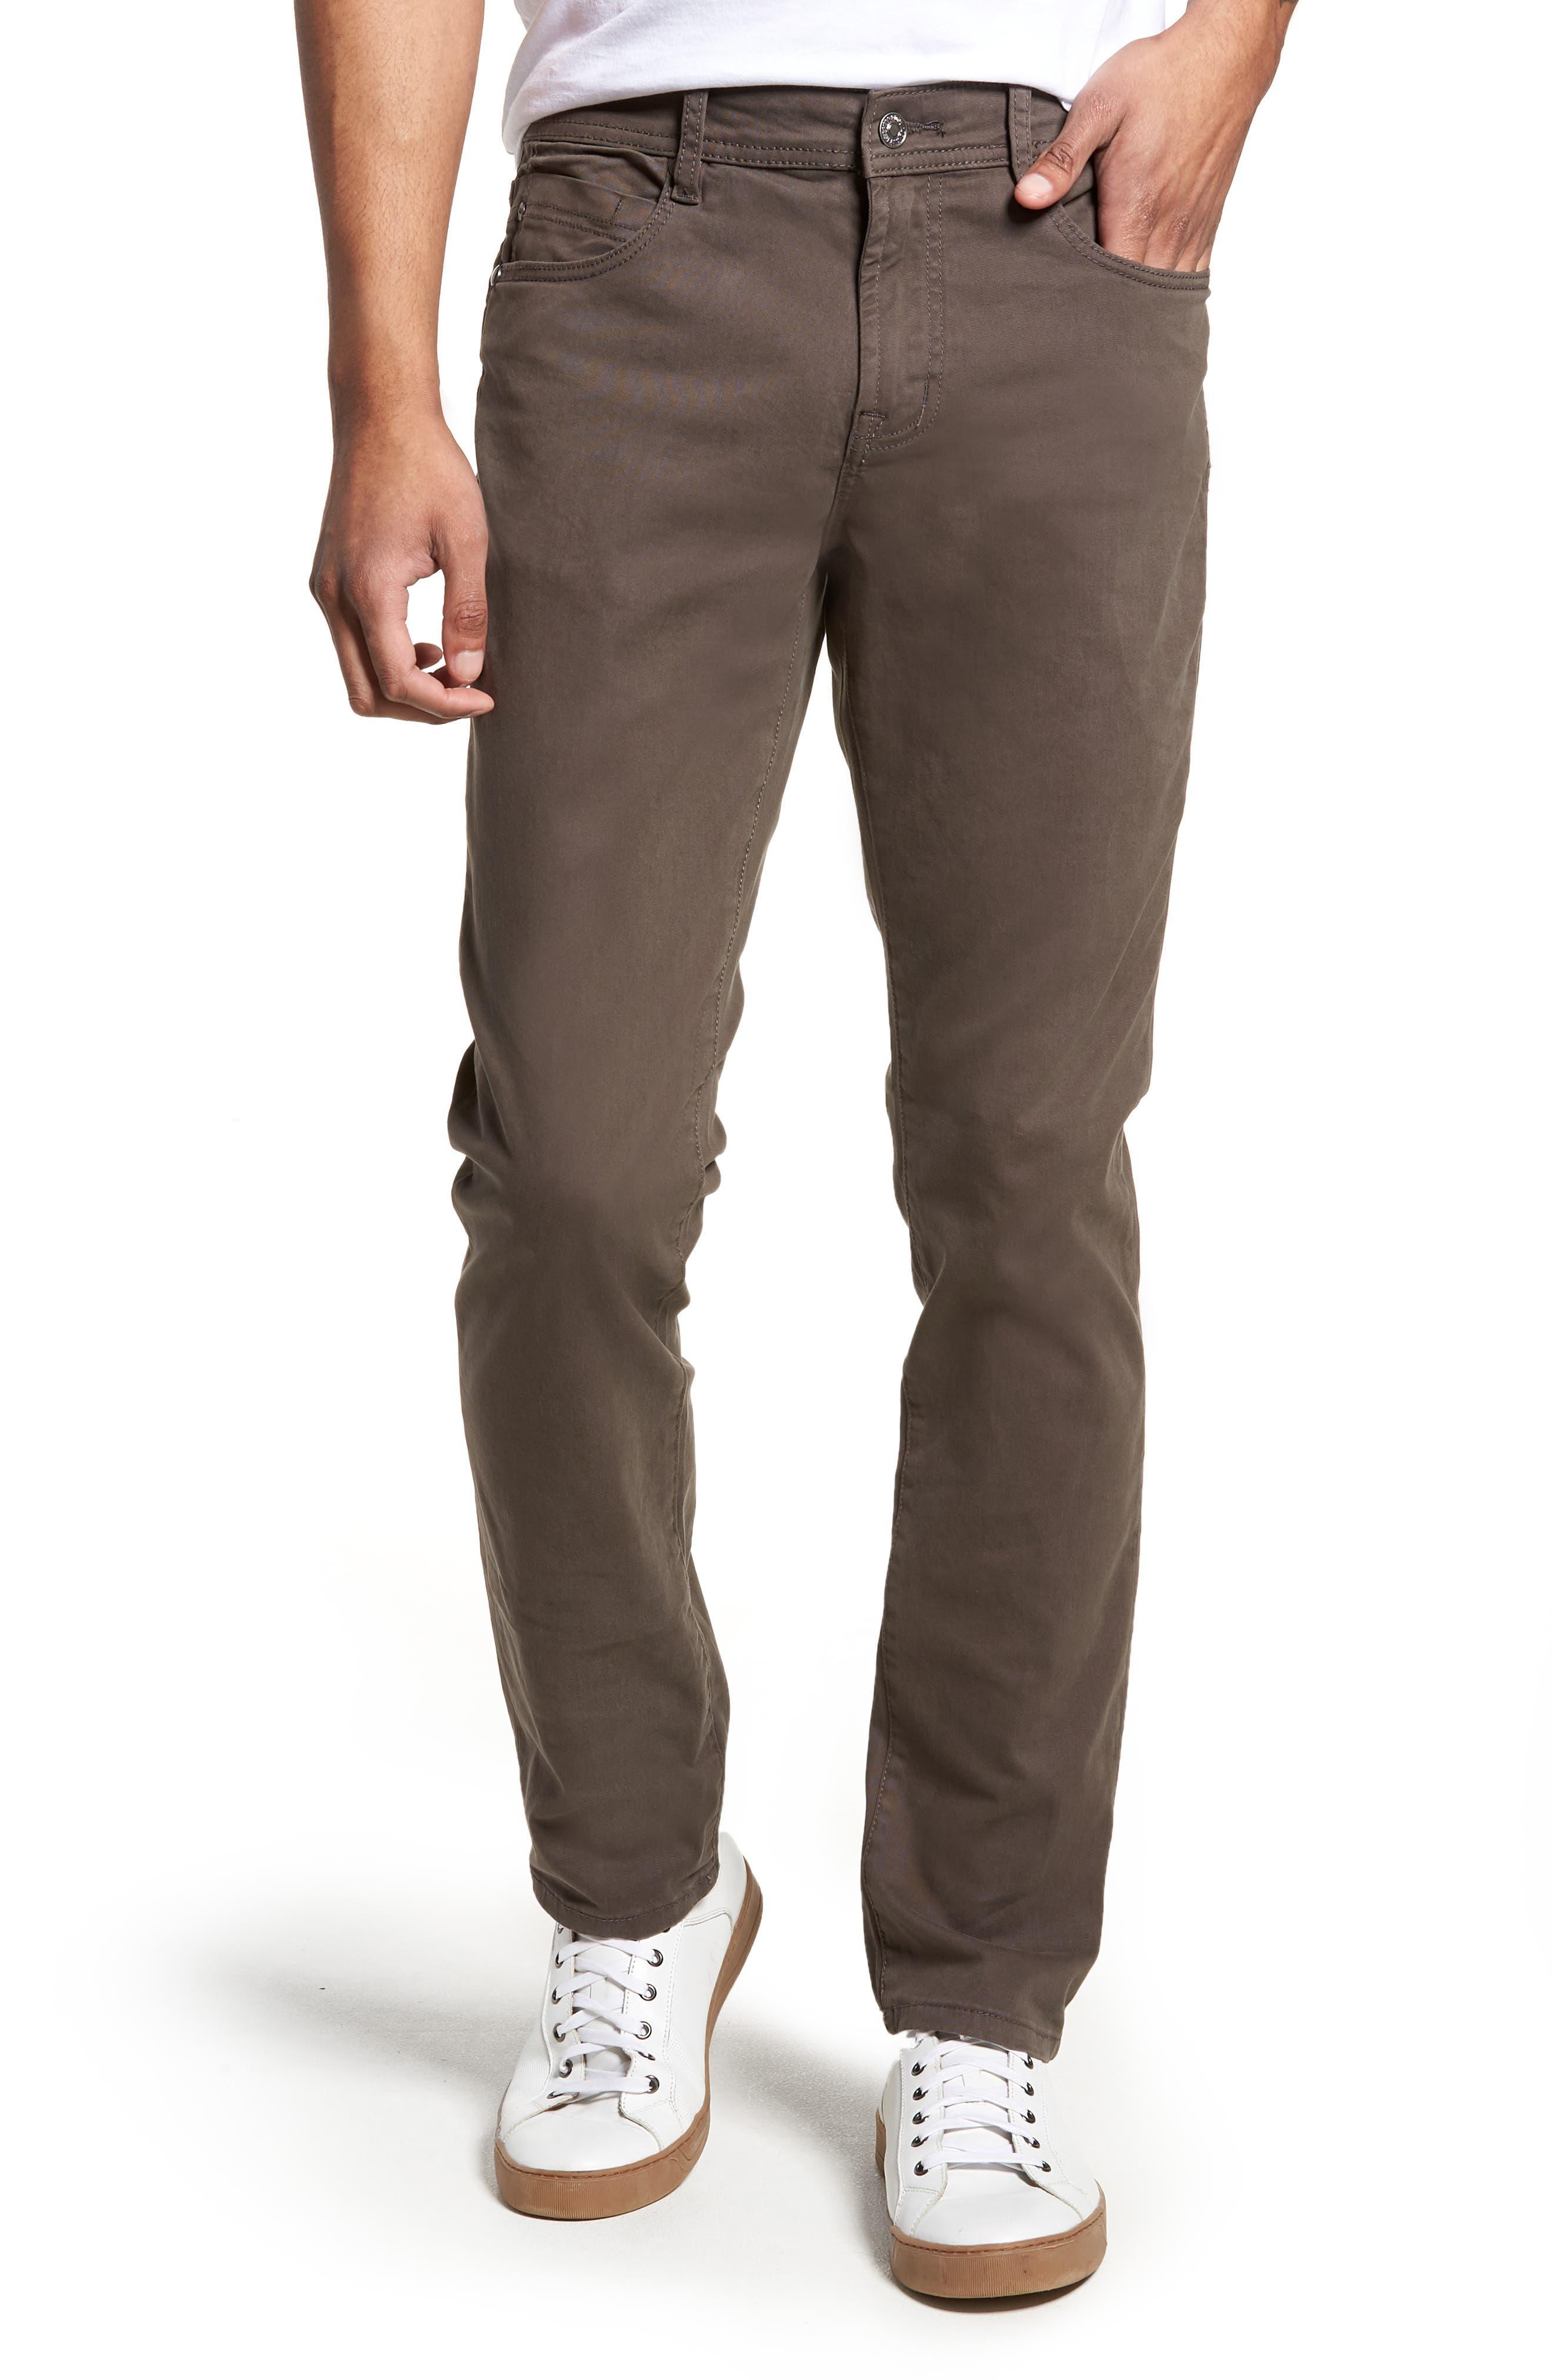 Jeans Co. Kingston Slim Straight Leg Jeans,                         Main,                         color, Deep Earth